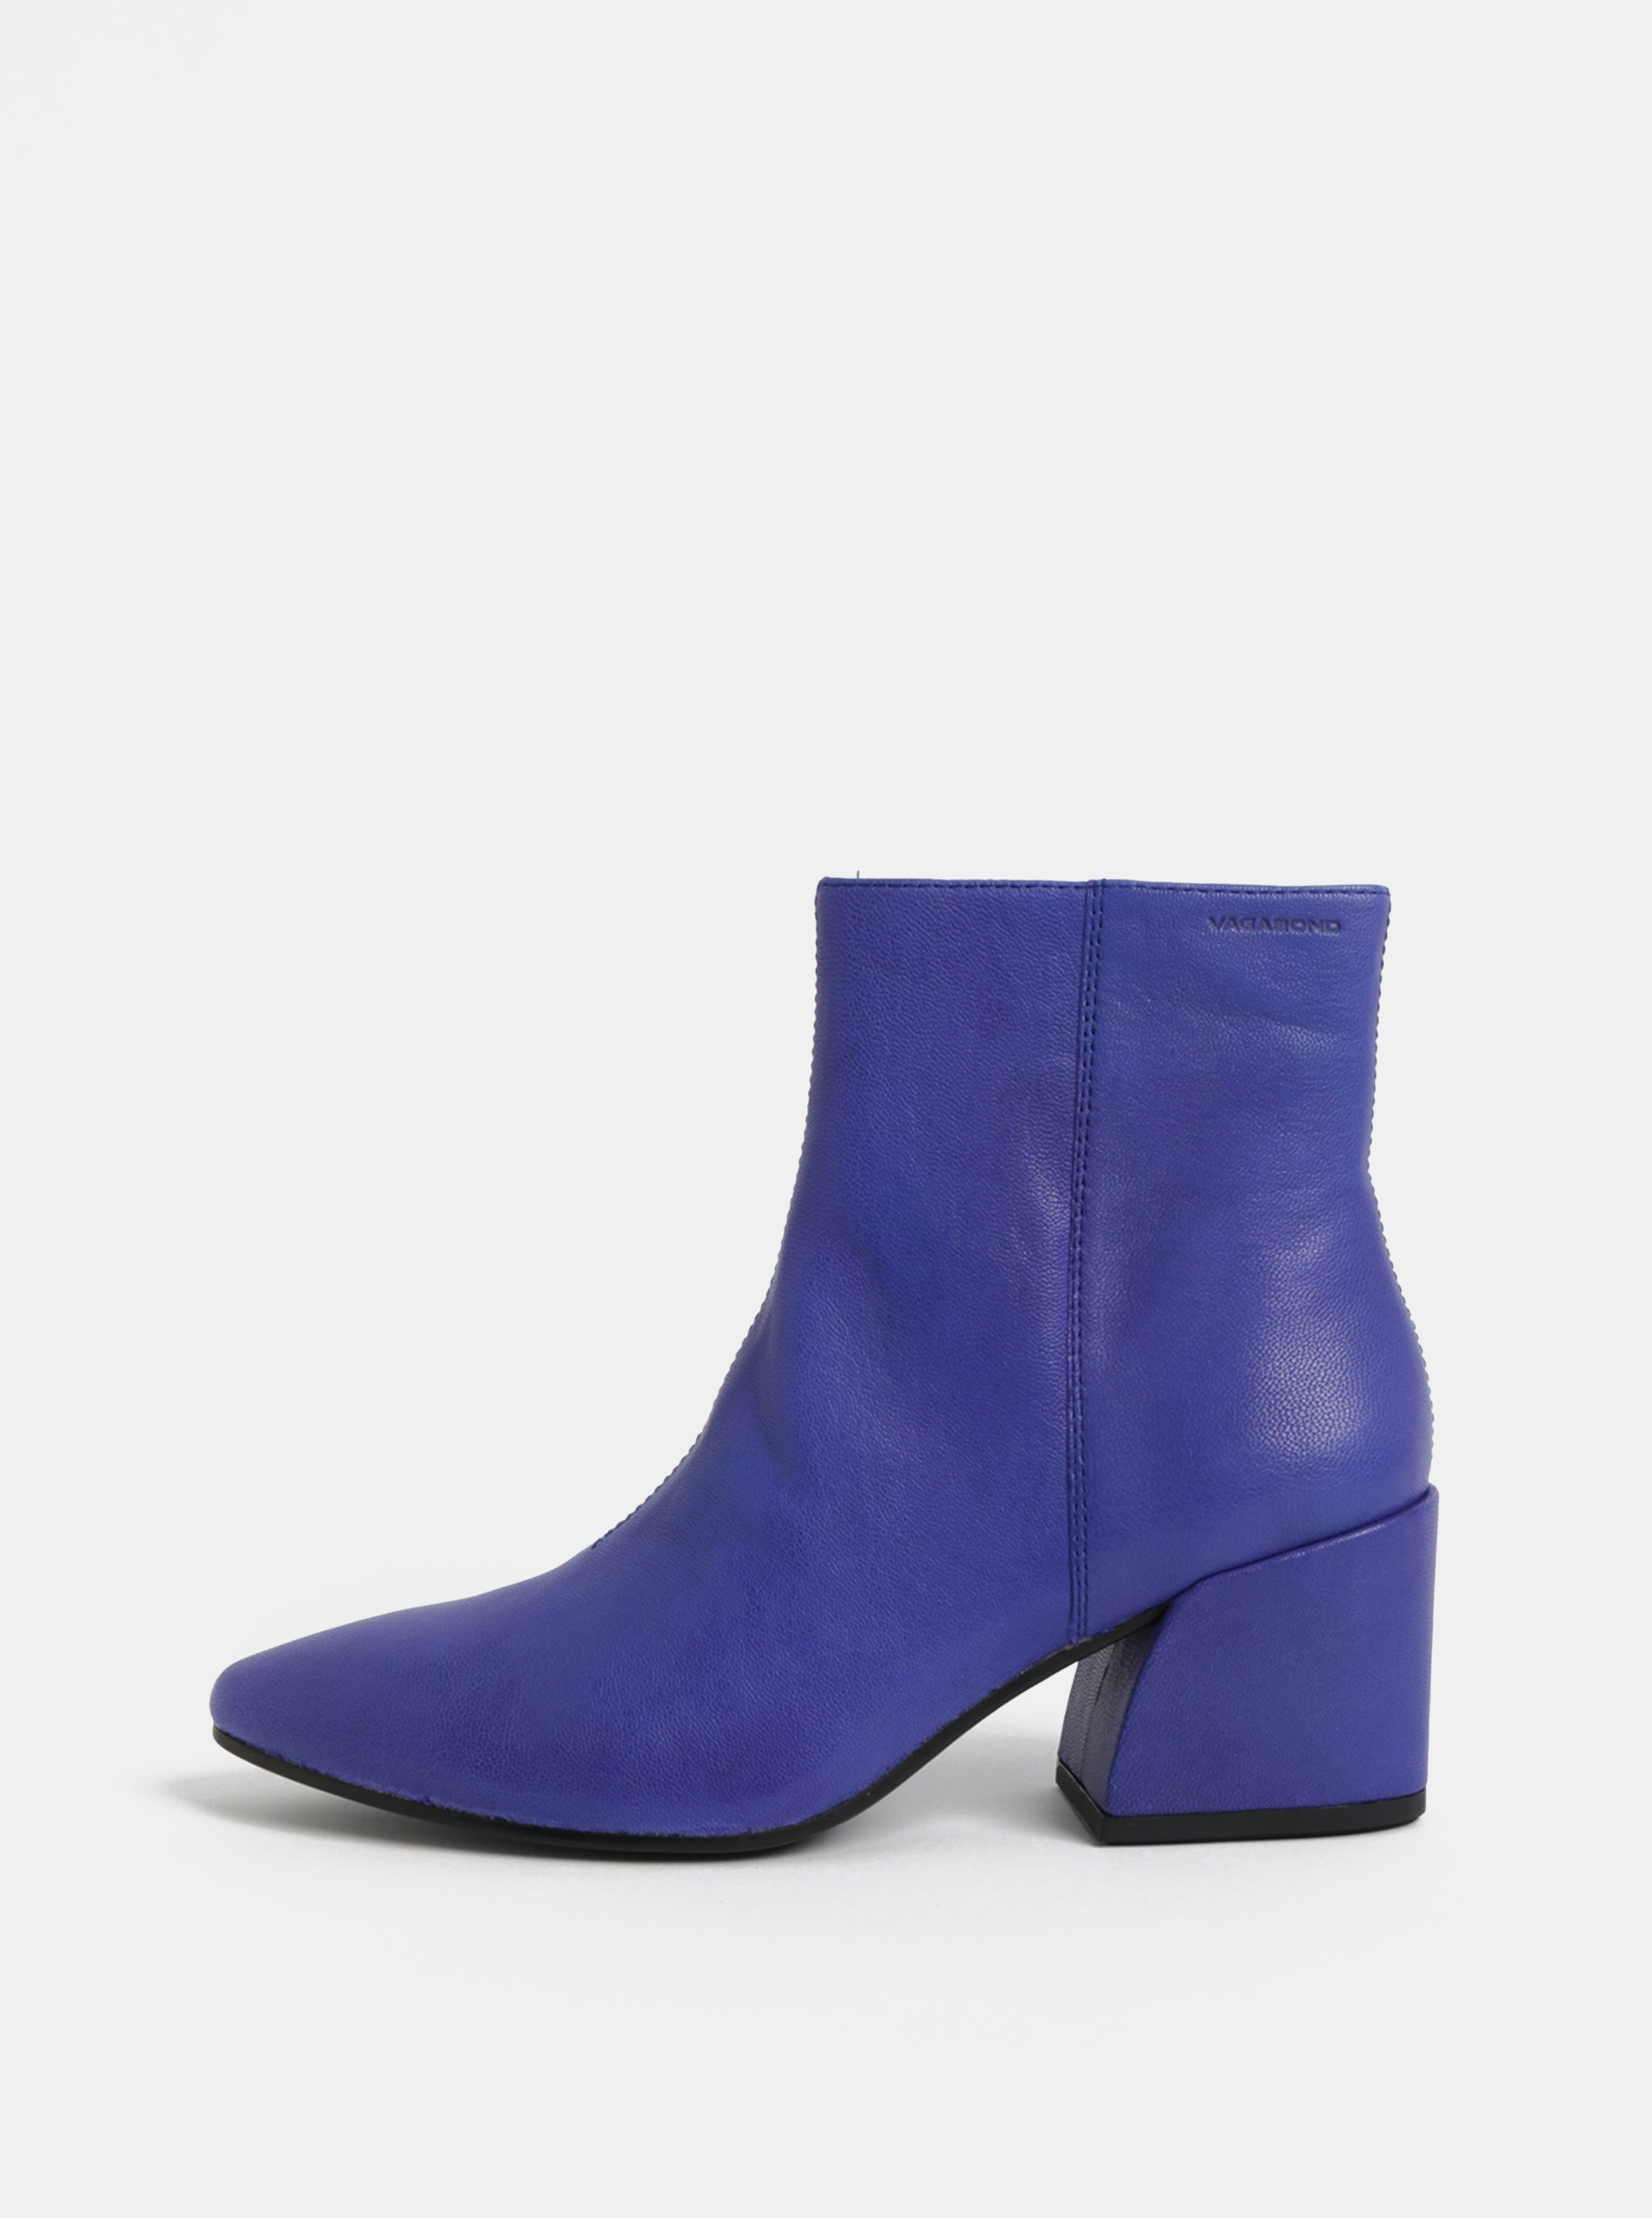 498d4a6093 Modré dámske kožené členkové topánky na podpätku Vagabond Olivia